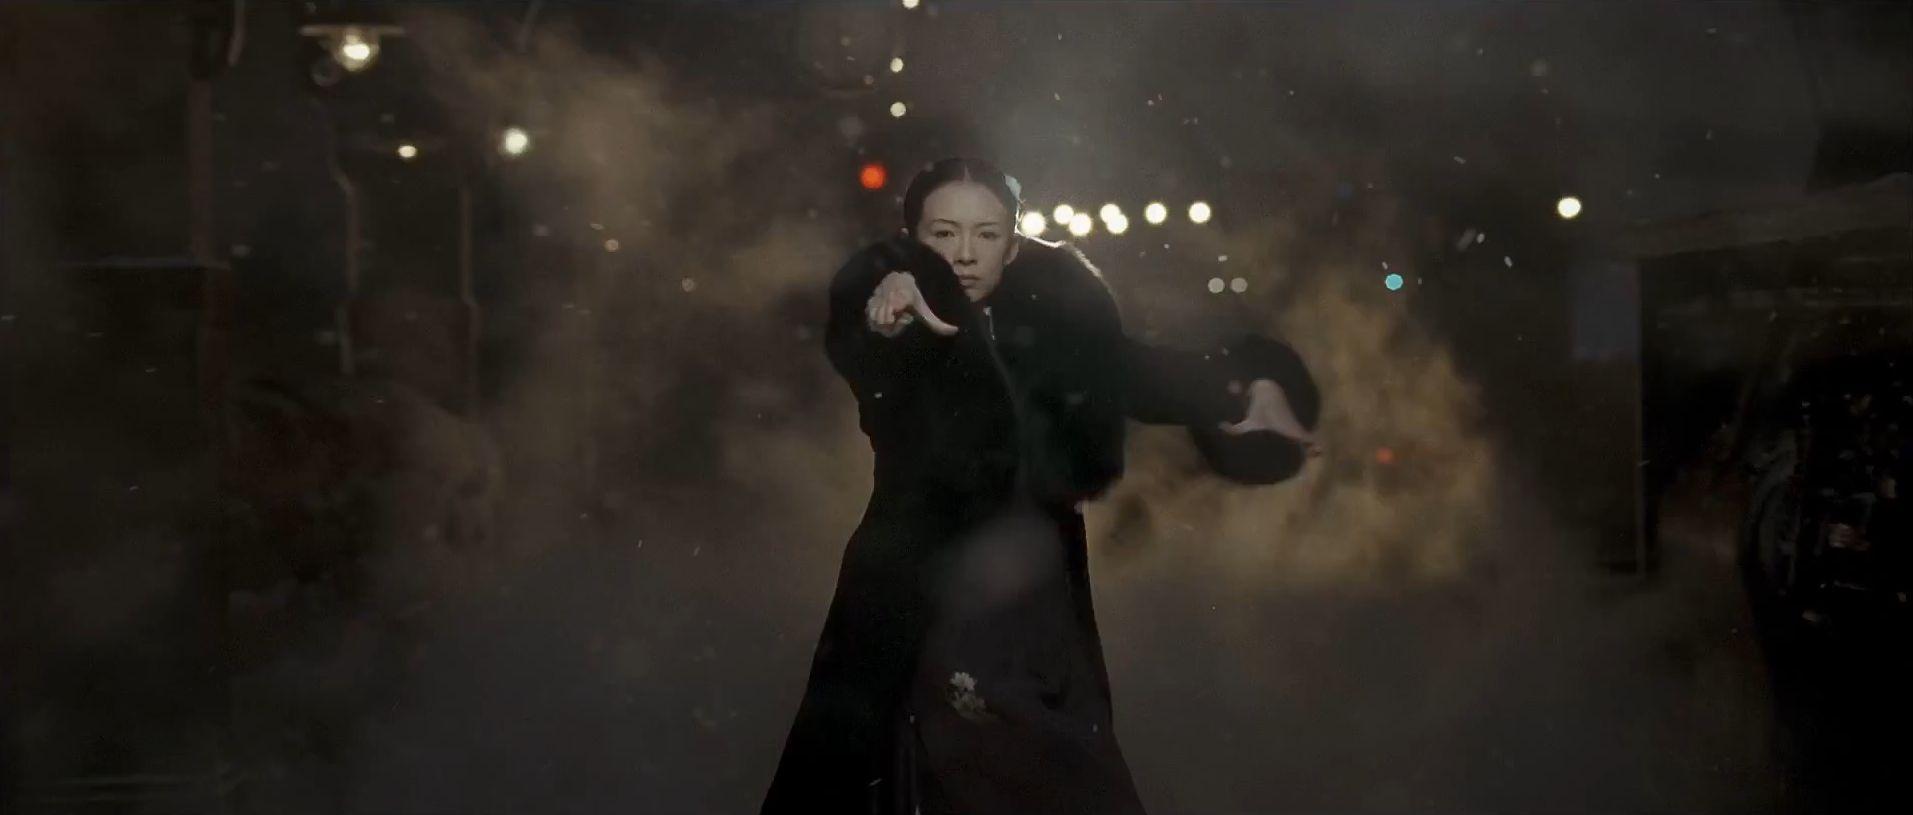 The grandmaster 2013 wong kar wai wonders in the dark tgm 3 voltagebd Choice Image